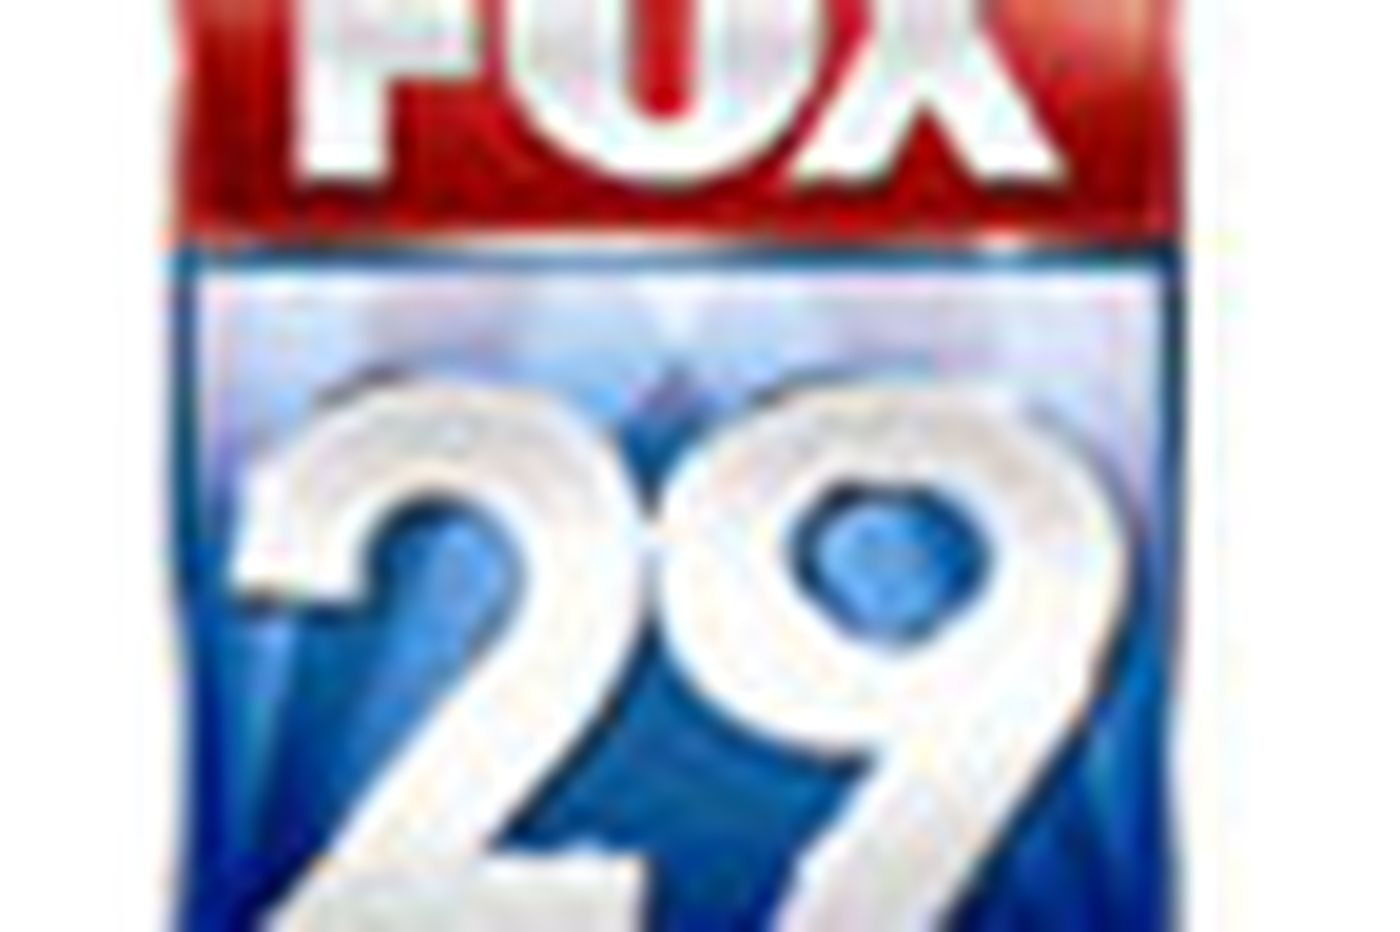 Dan Gross: Fox 29 camera staff vote to strike